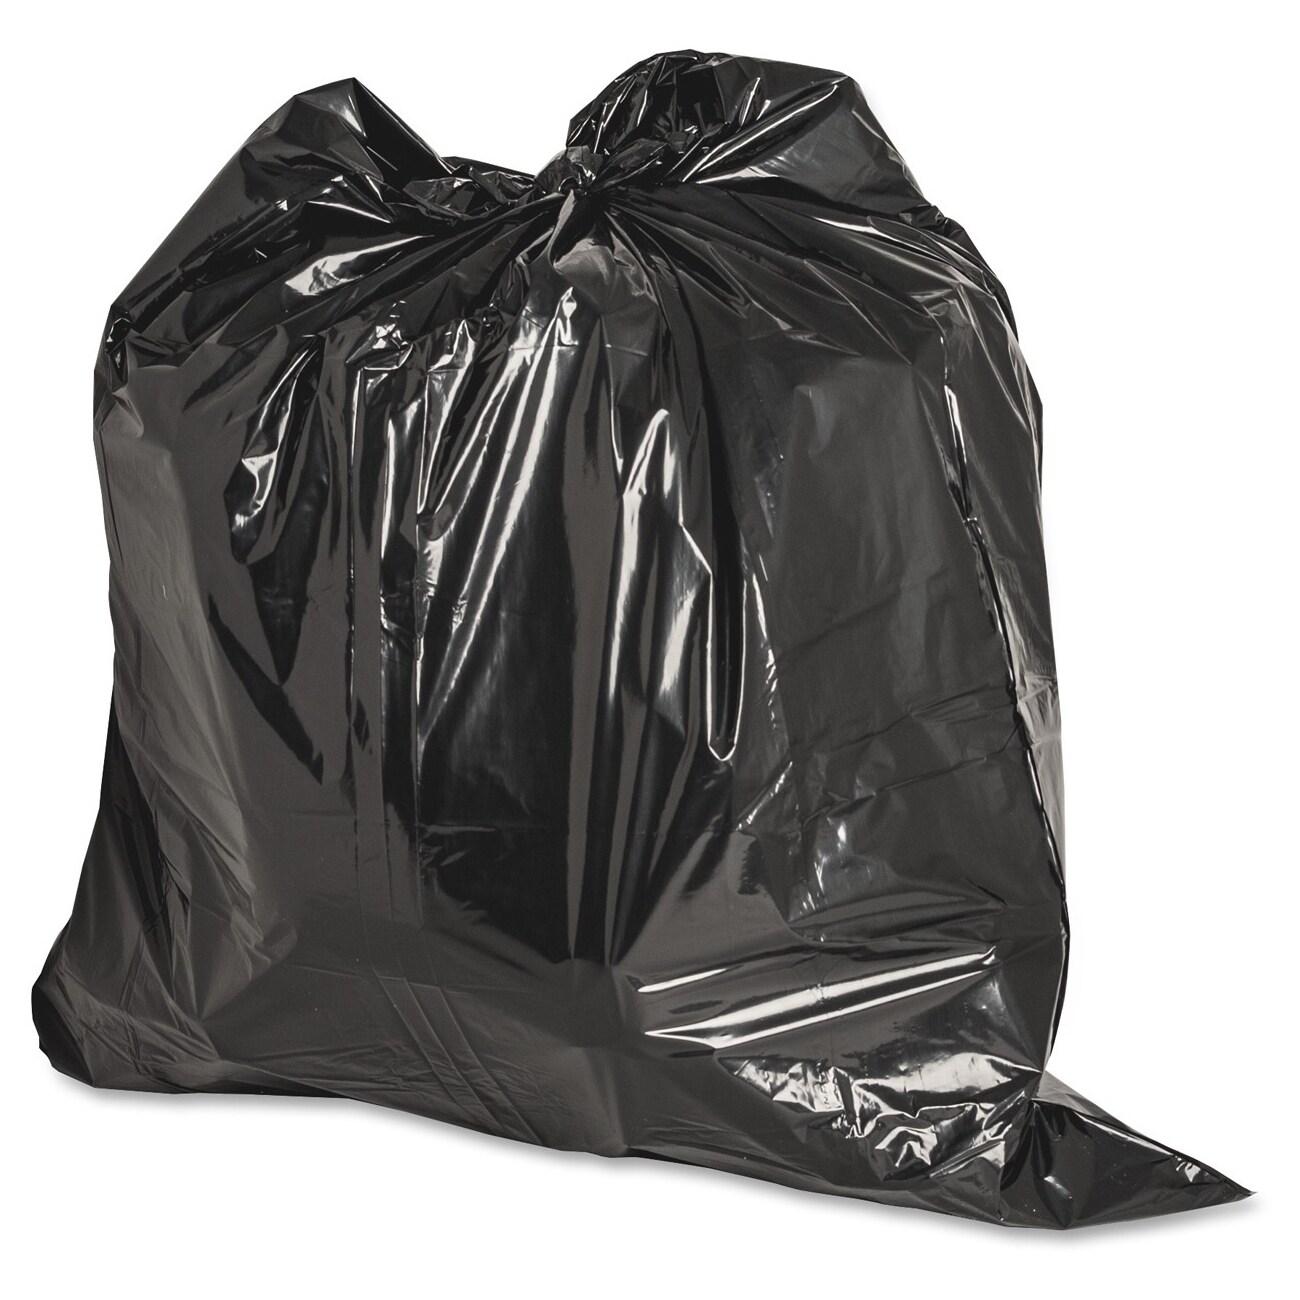 Genuine Joe Heavy Duty Trash Bag Box Of 50 Free Shipping On Orders Over 45 10012072